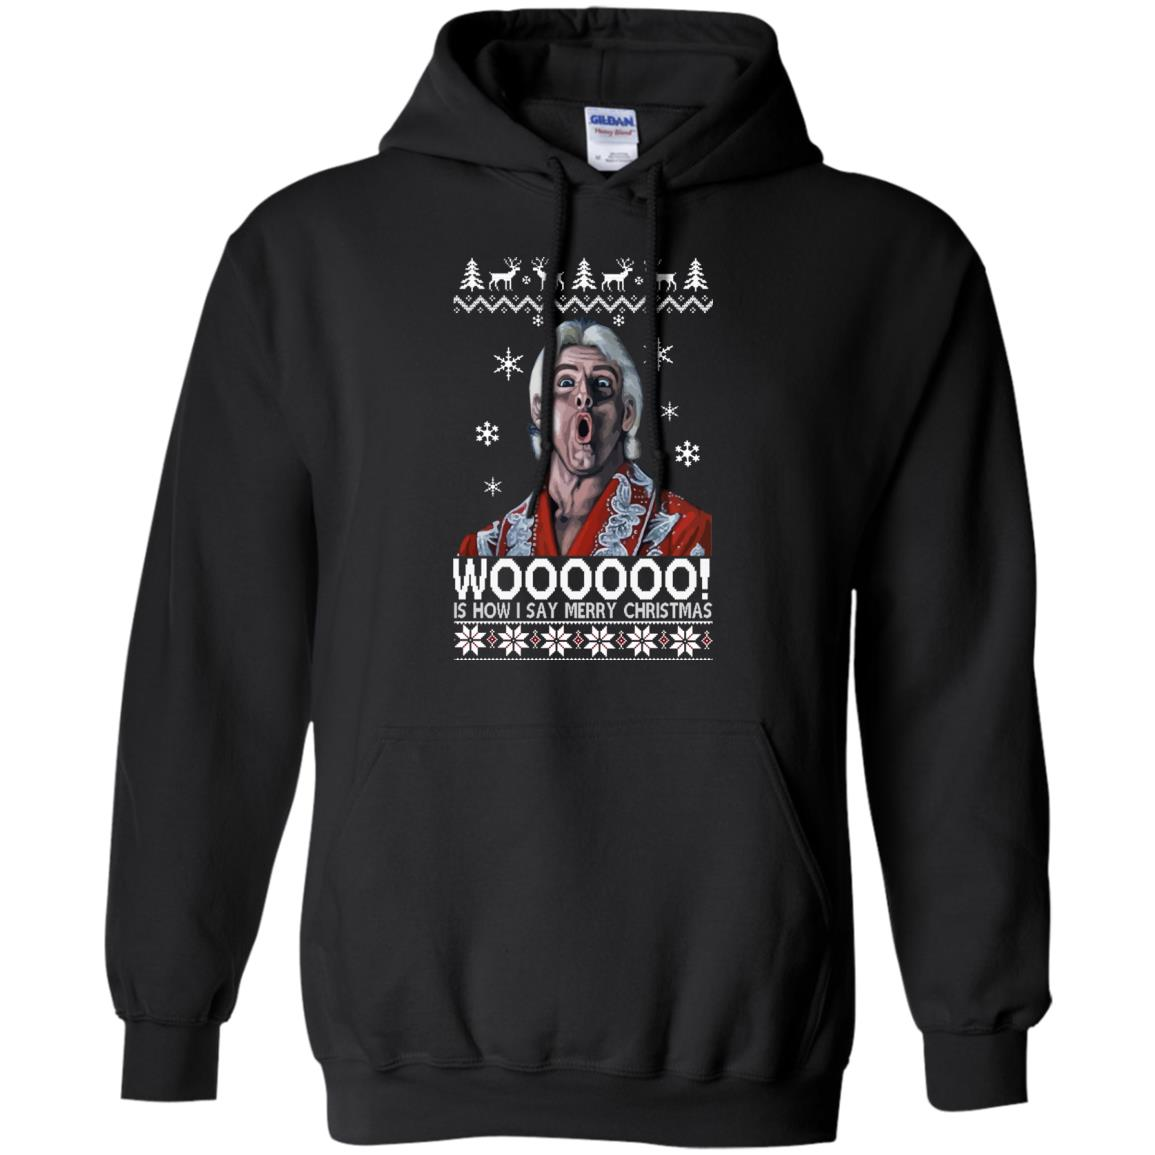 image 1639 - Green Ric Flair WOO Christmas Sweater, Ugly Sweatshirt